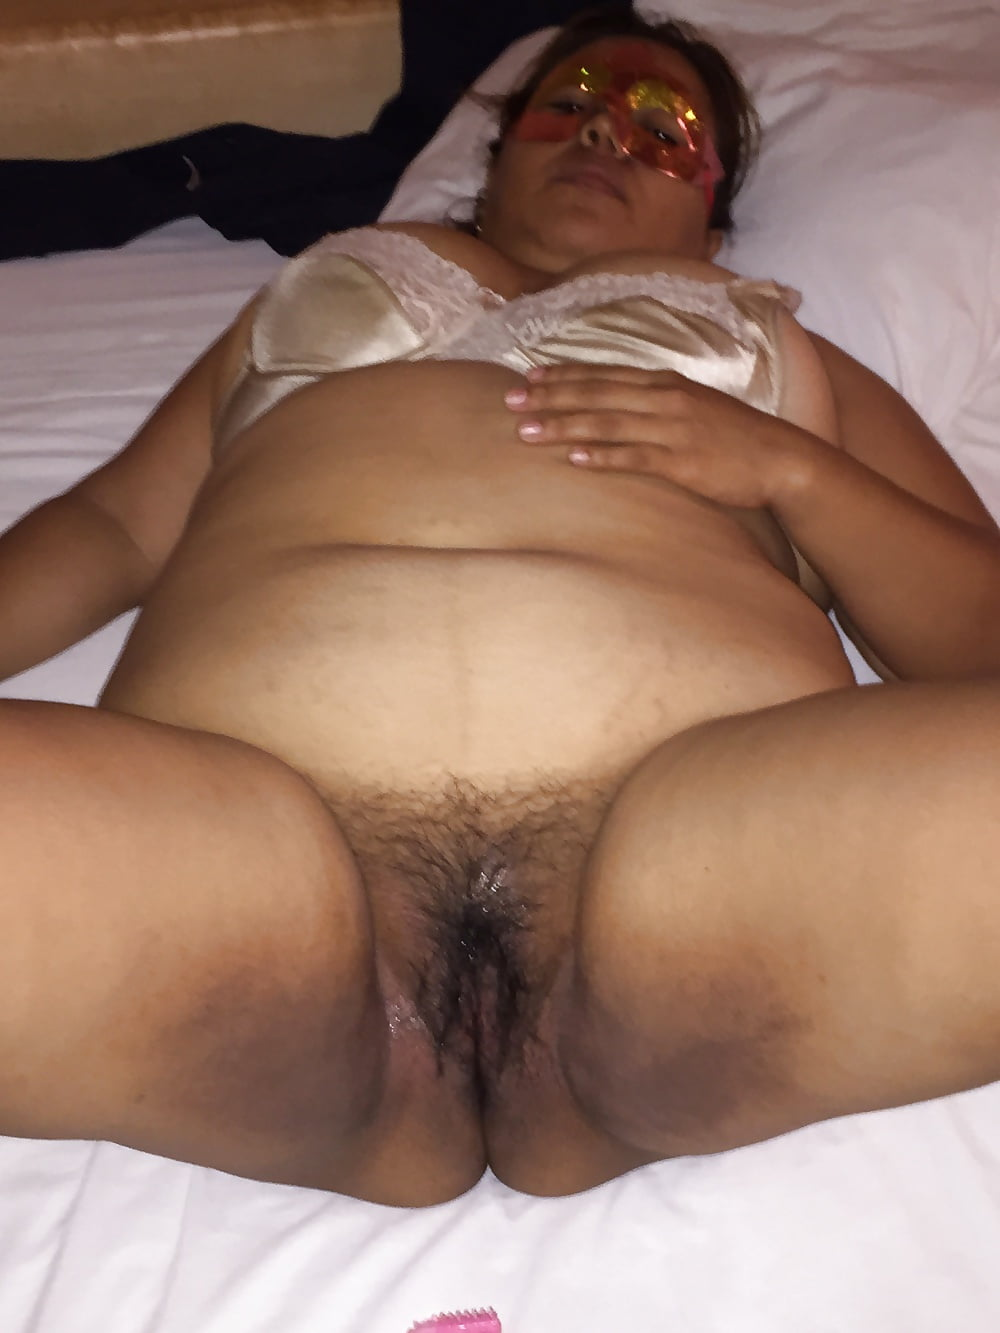 Lesbicos extremos pelicula - 1 part 4